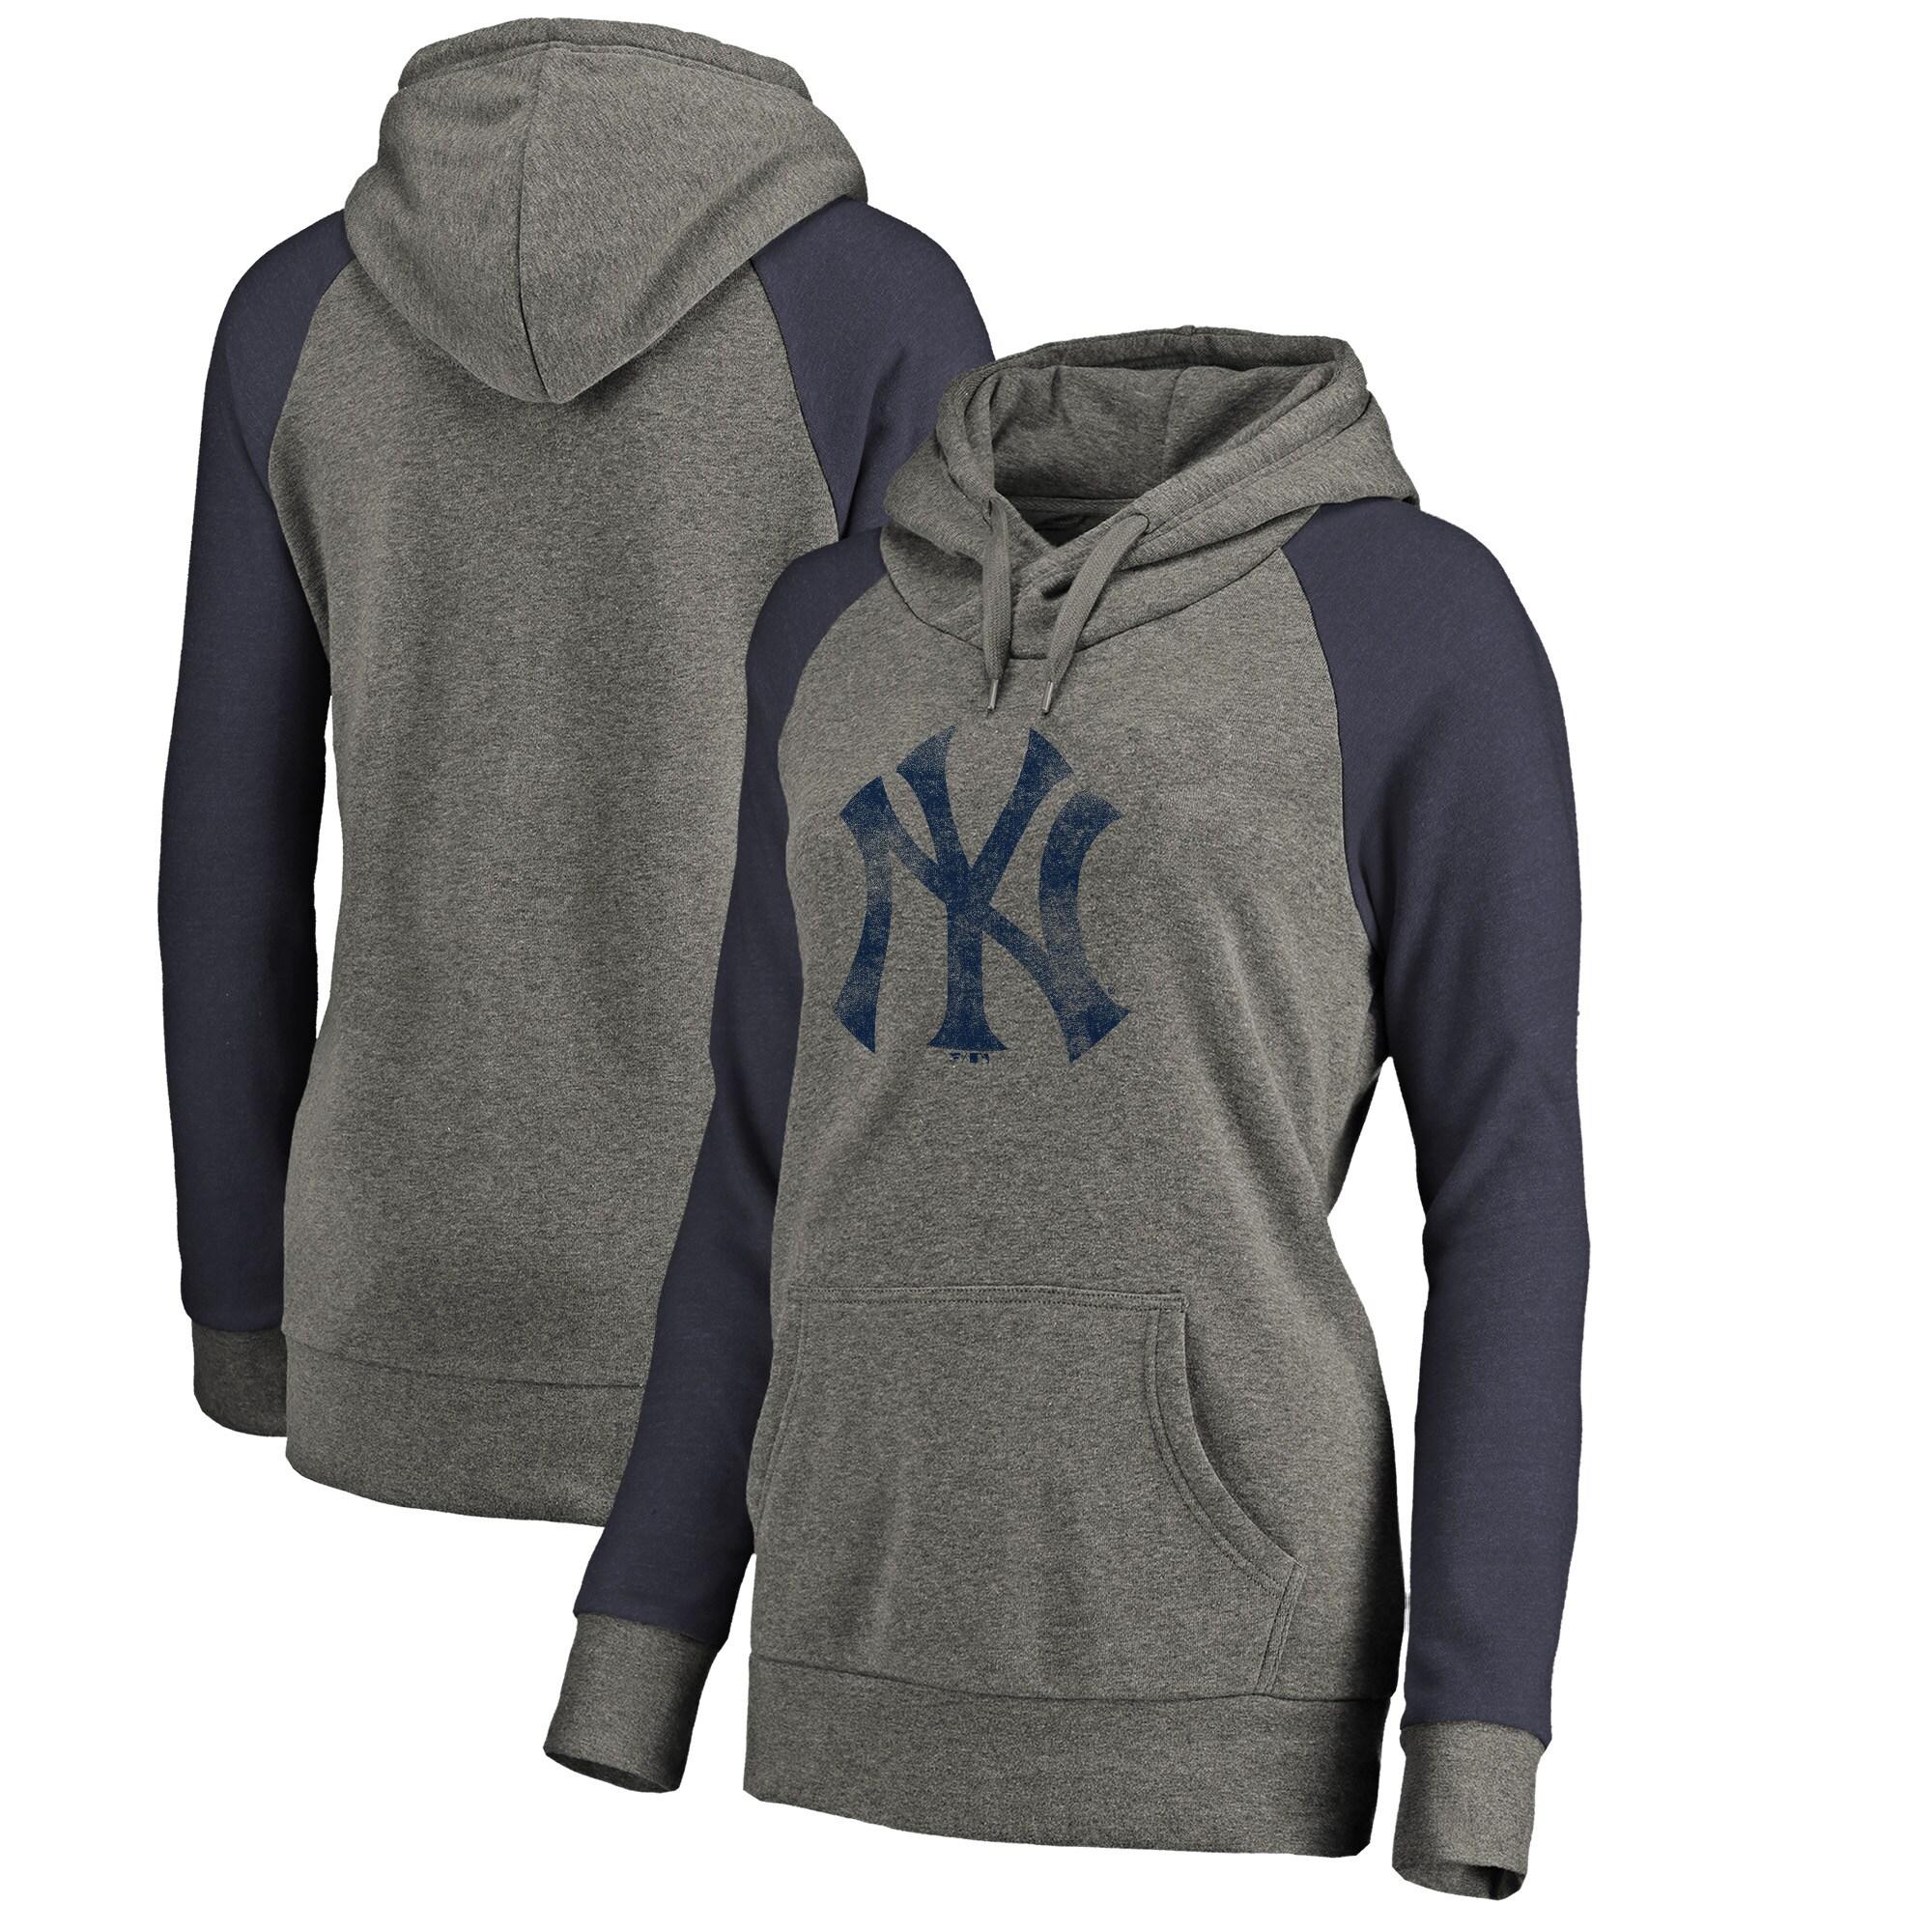 New York Yankees Fanatics Branded Women's Distressed Team Logo Tri-Blend Raglan Pullover Hoodie - Gray/Navy